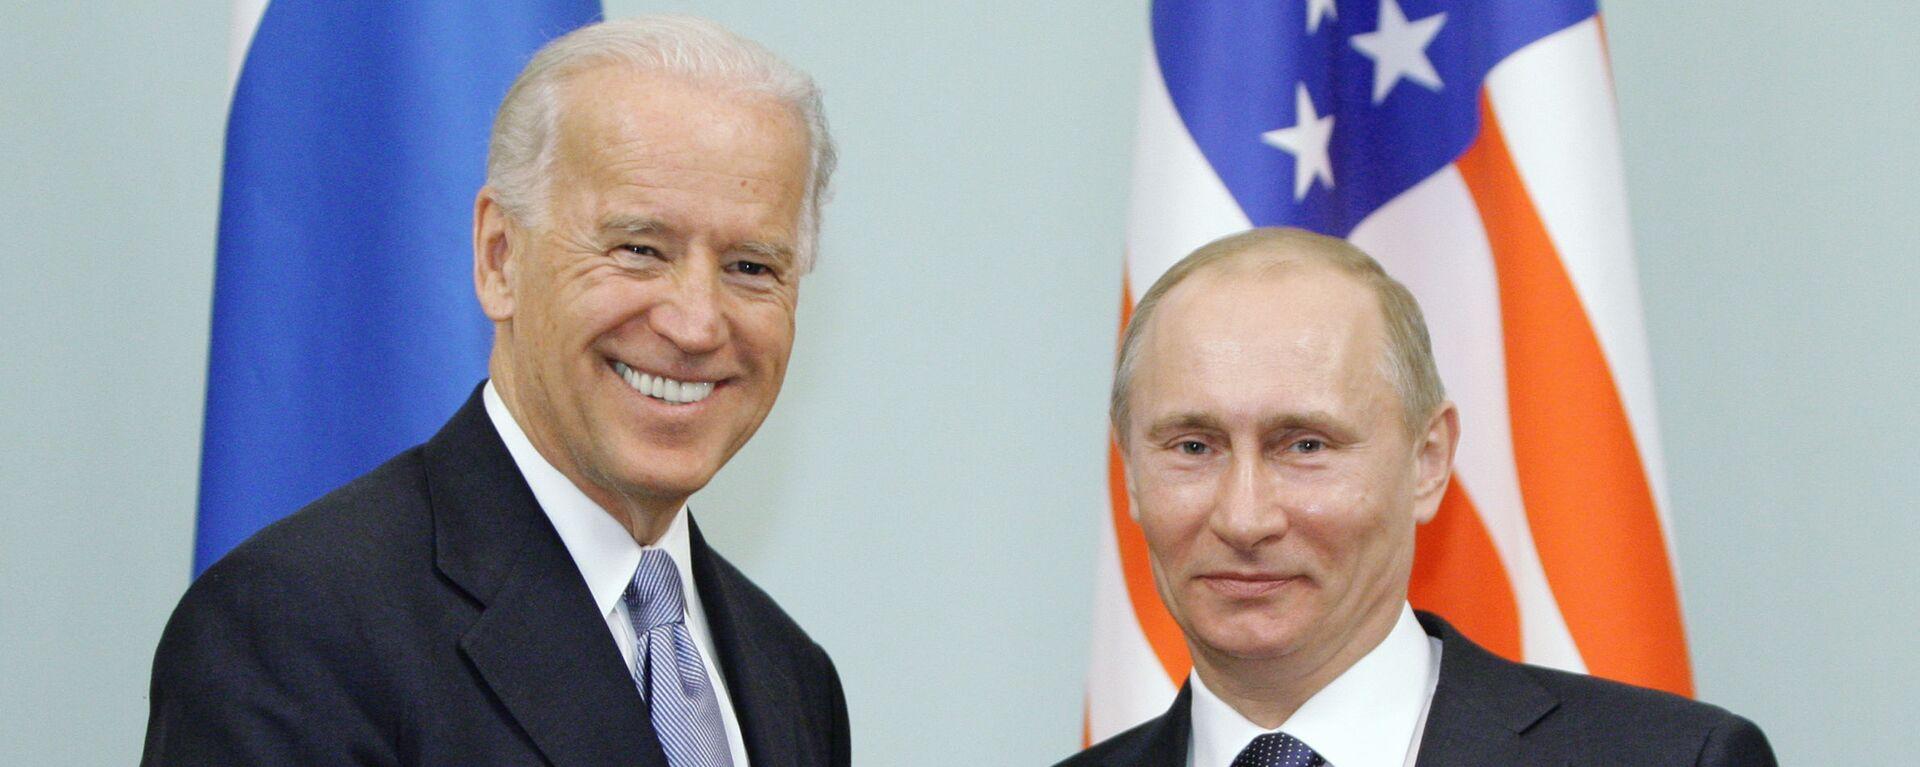 Vladimir Putin a Joe Biden v roce 2011 - Sputnik Česká republika, 1920, 09.07.2021